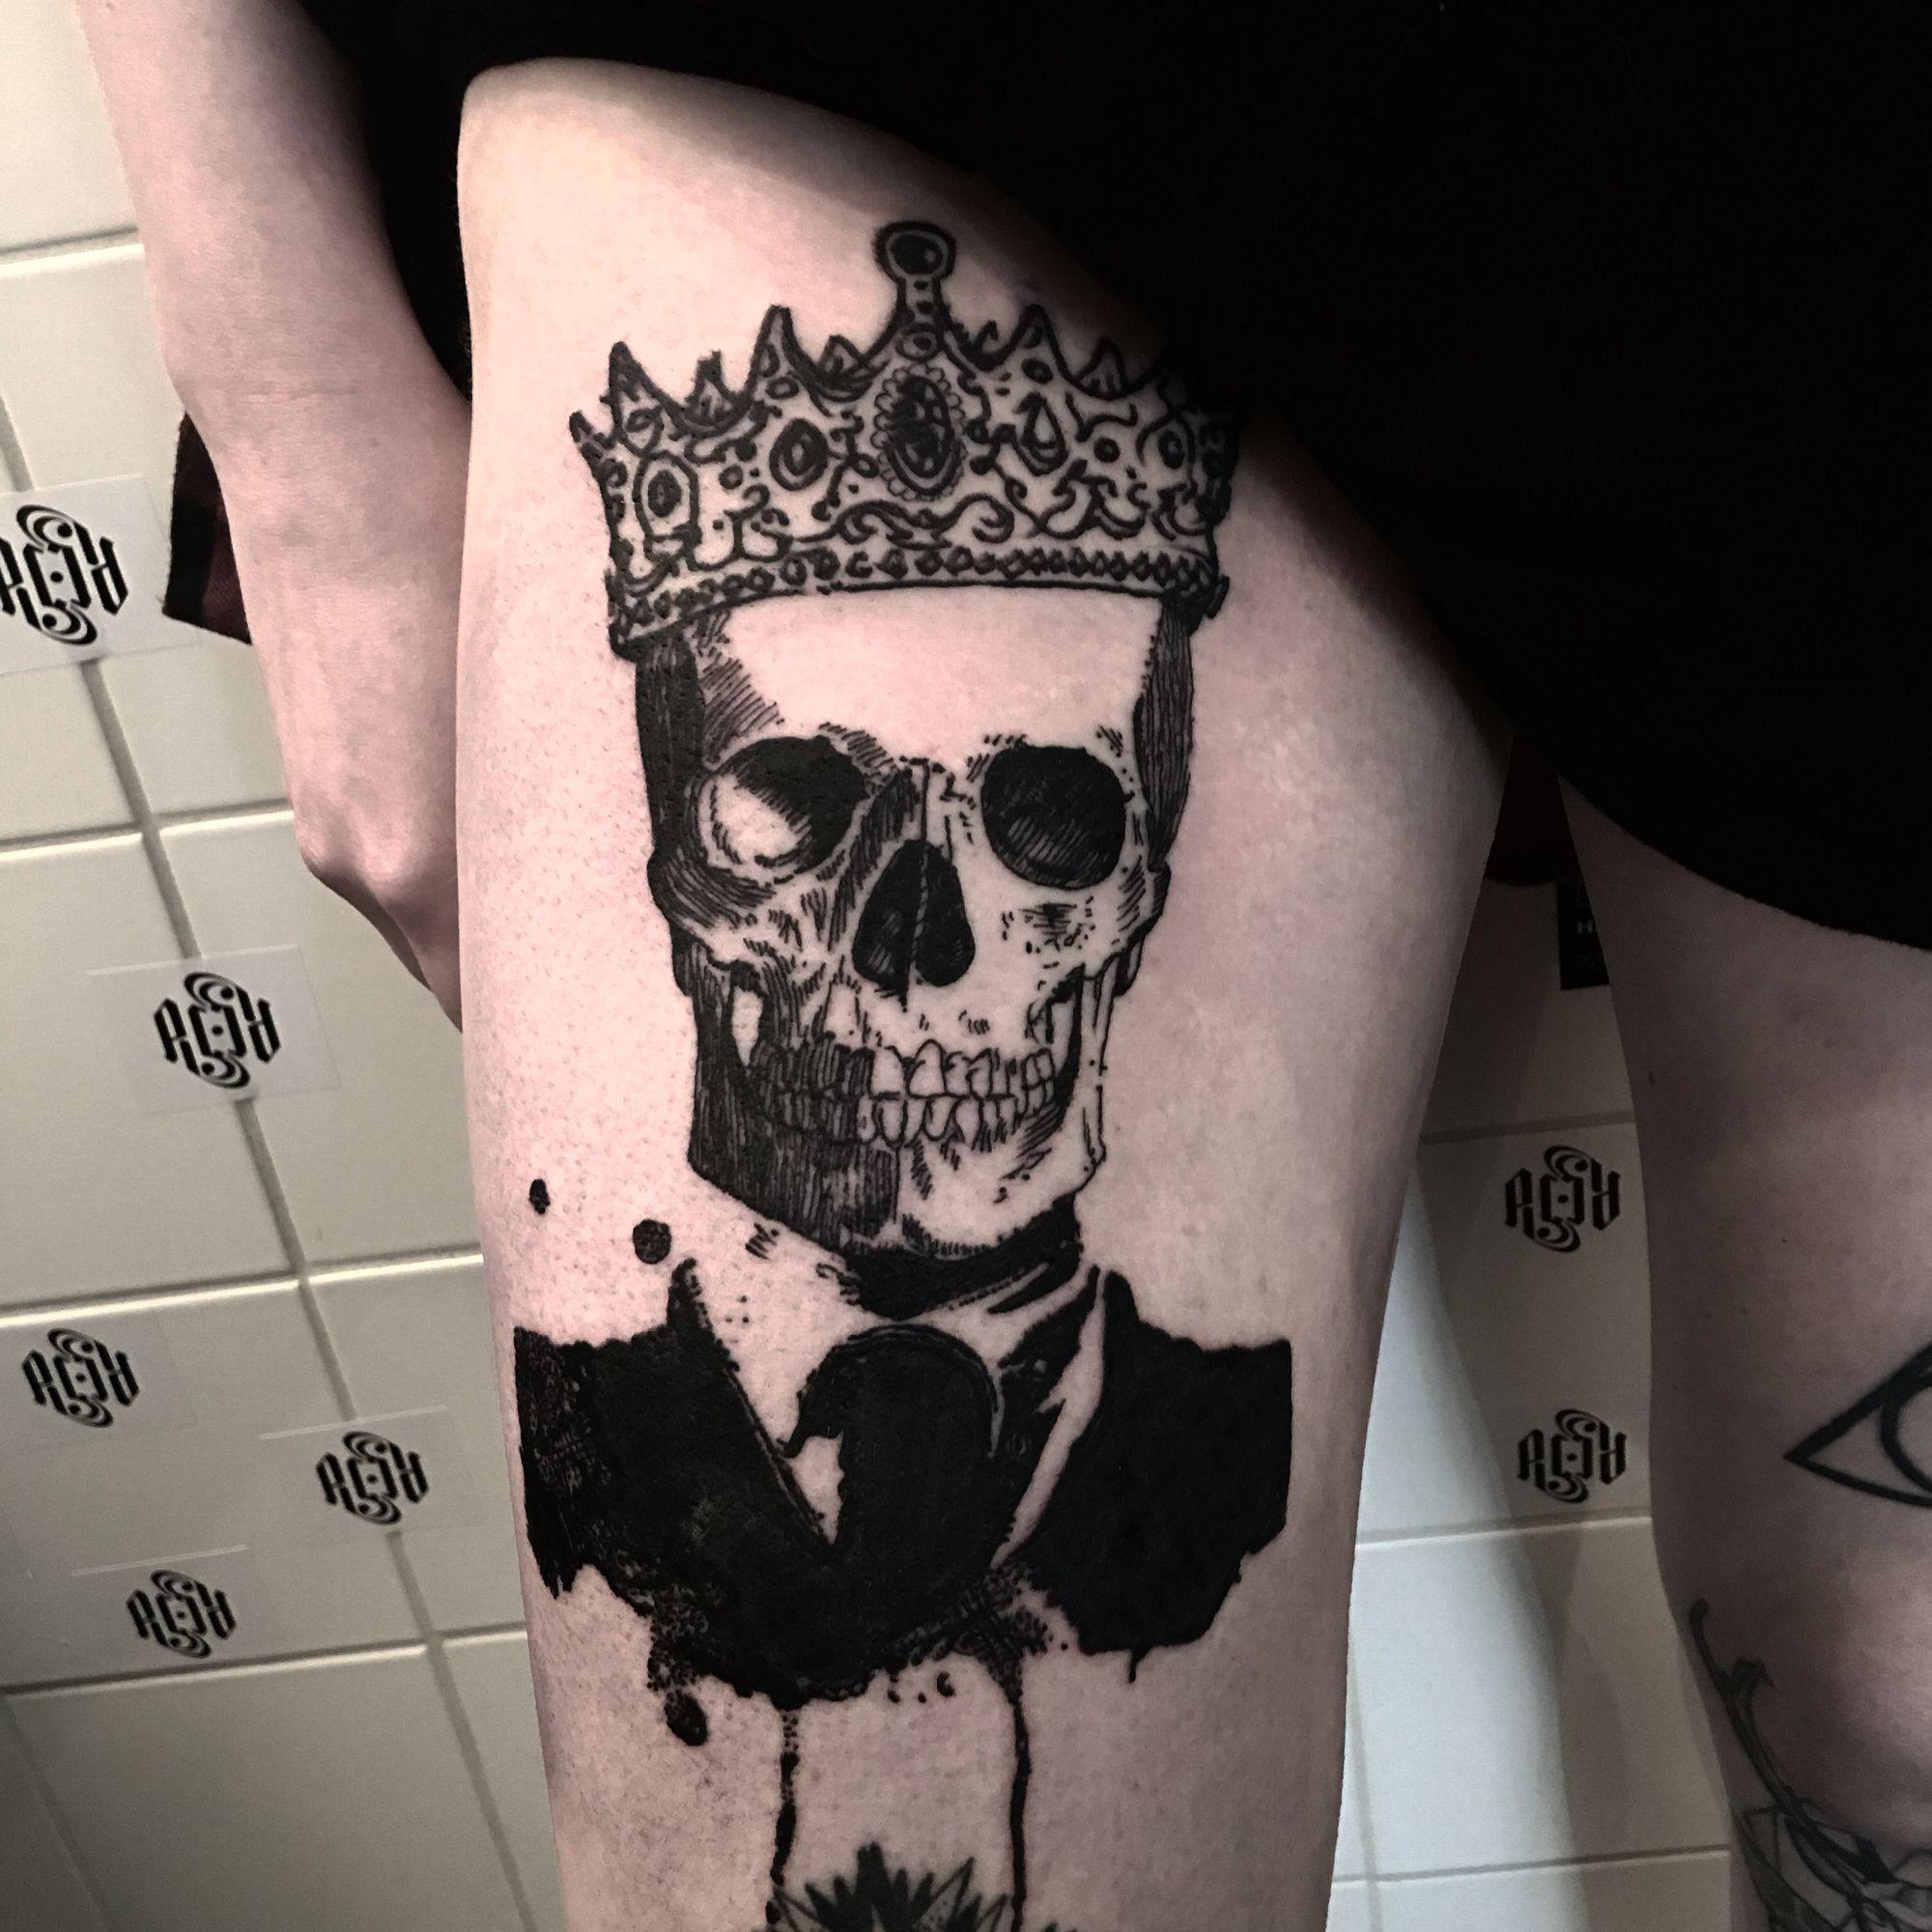 skull tattoo with crown and splatter effect thomas acid acid tattoo my work splatter tattoos. Black Bedroom Furniture Sets. Home Design Ideas